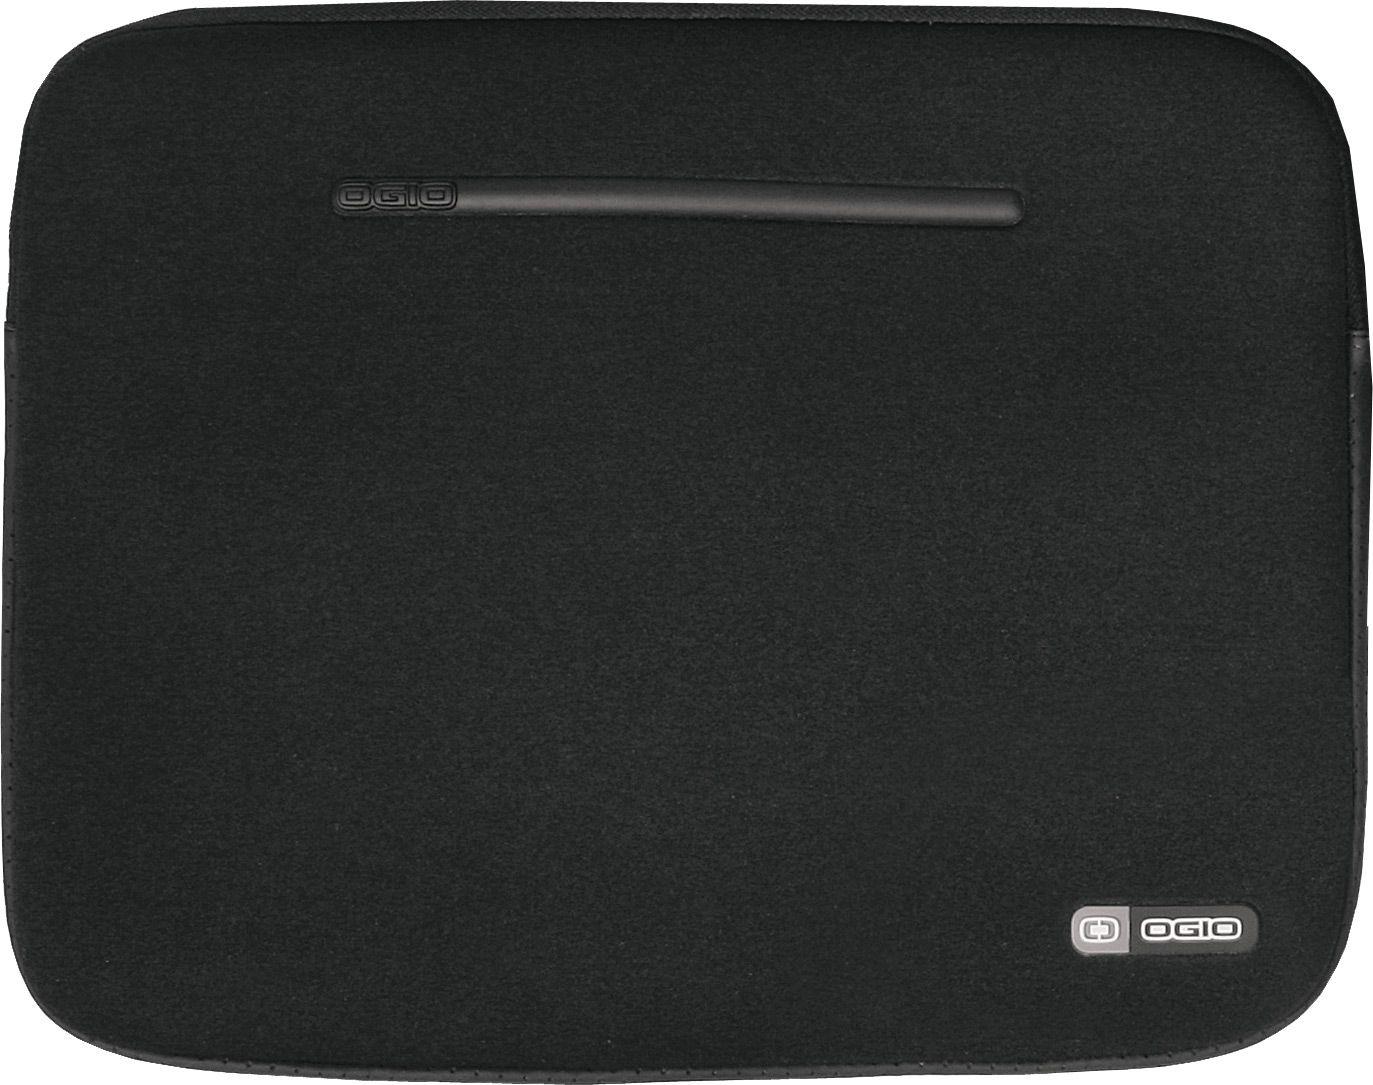 Ogio 15inch Neoprene Laptop Sleeve | Travel bags